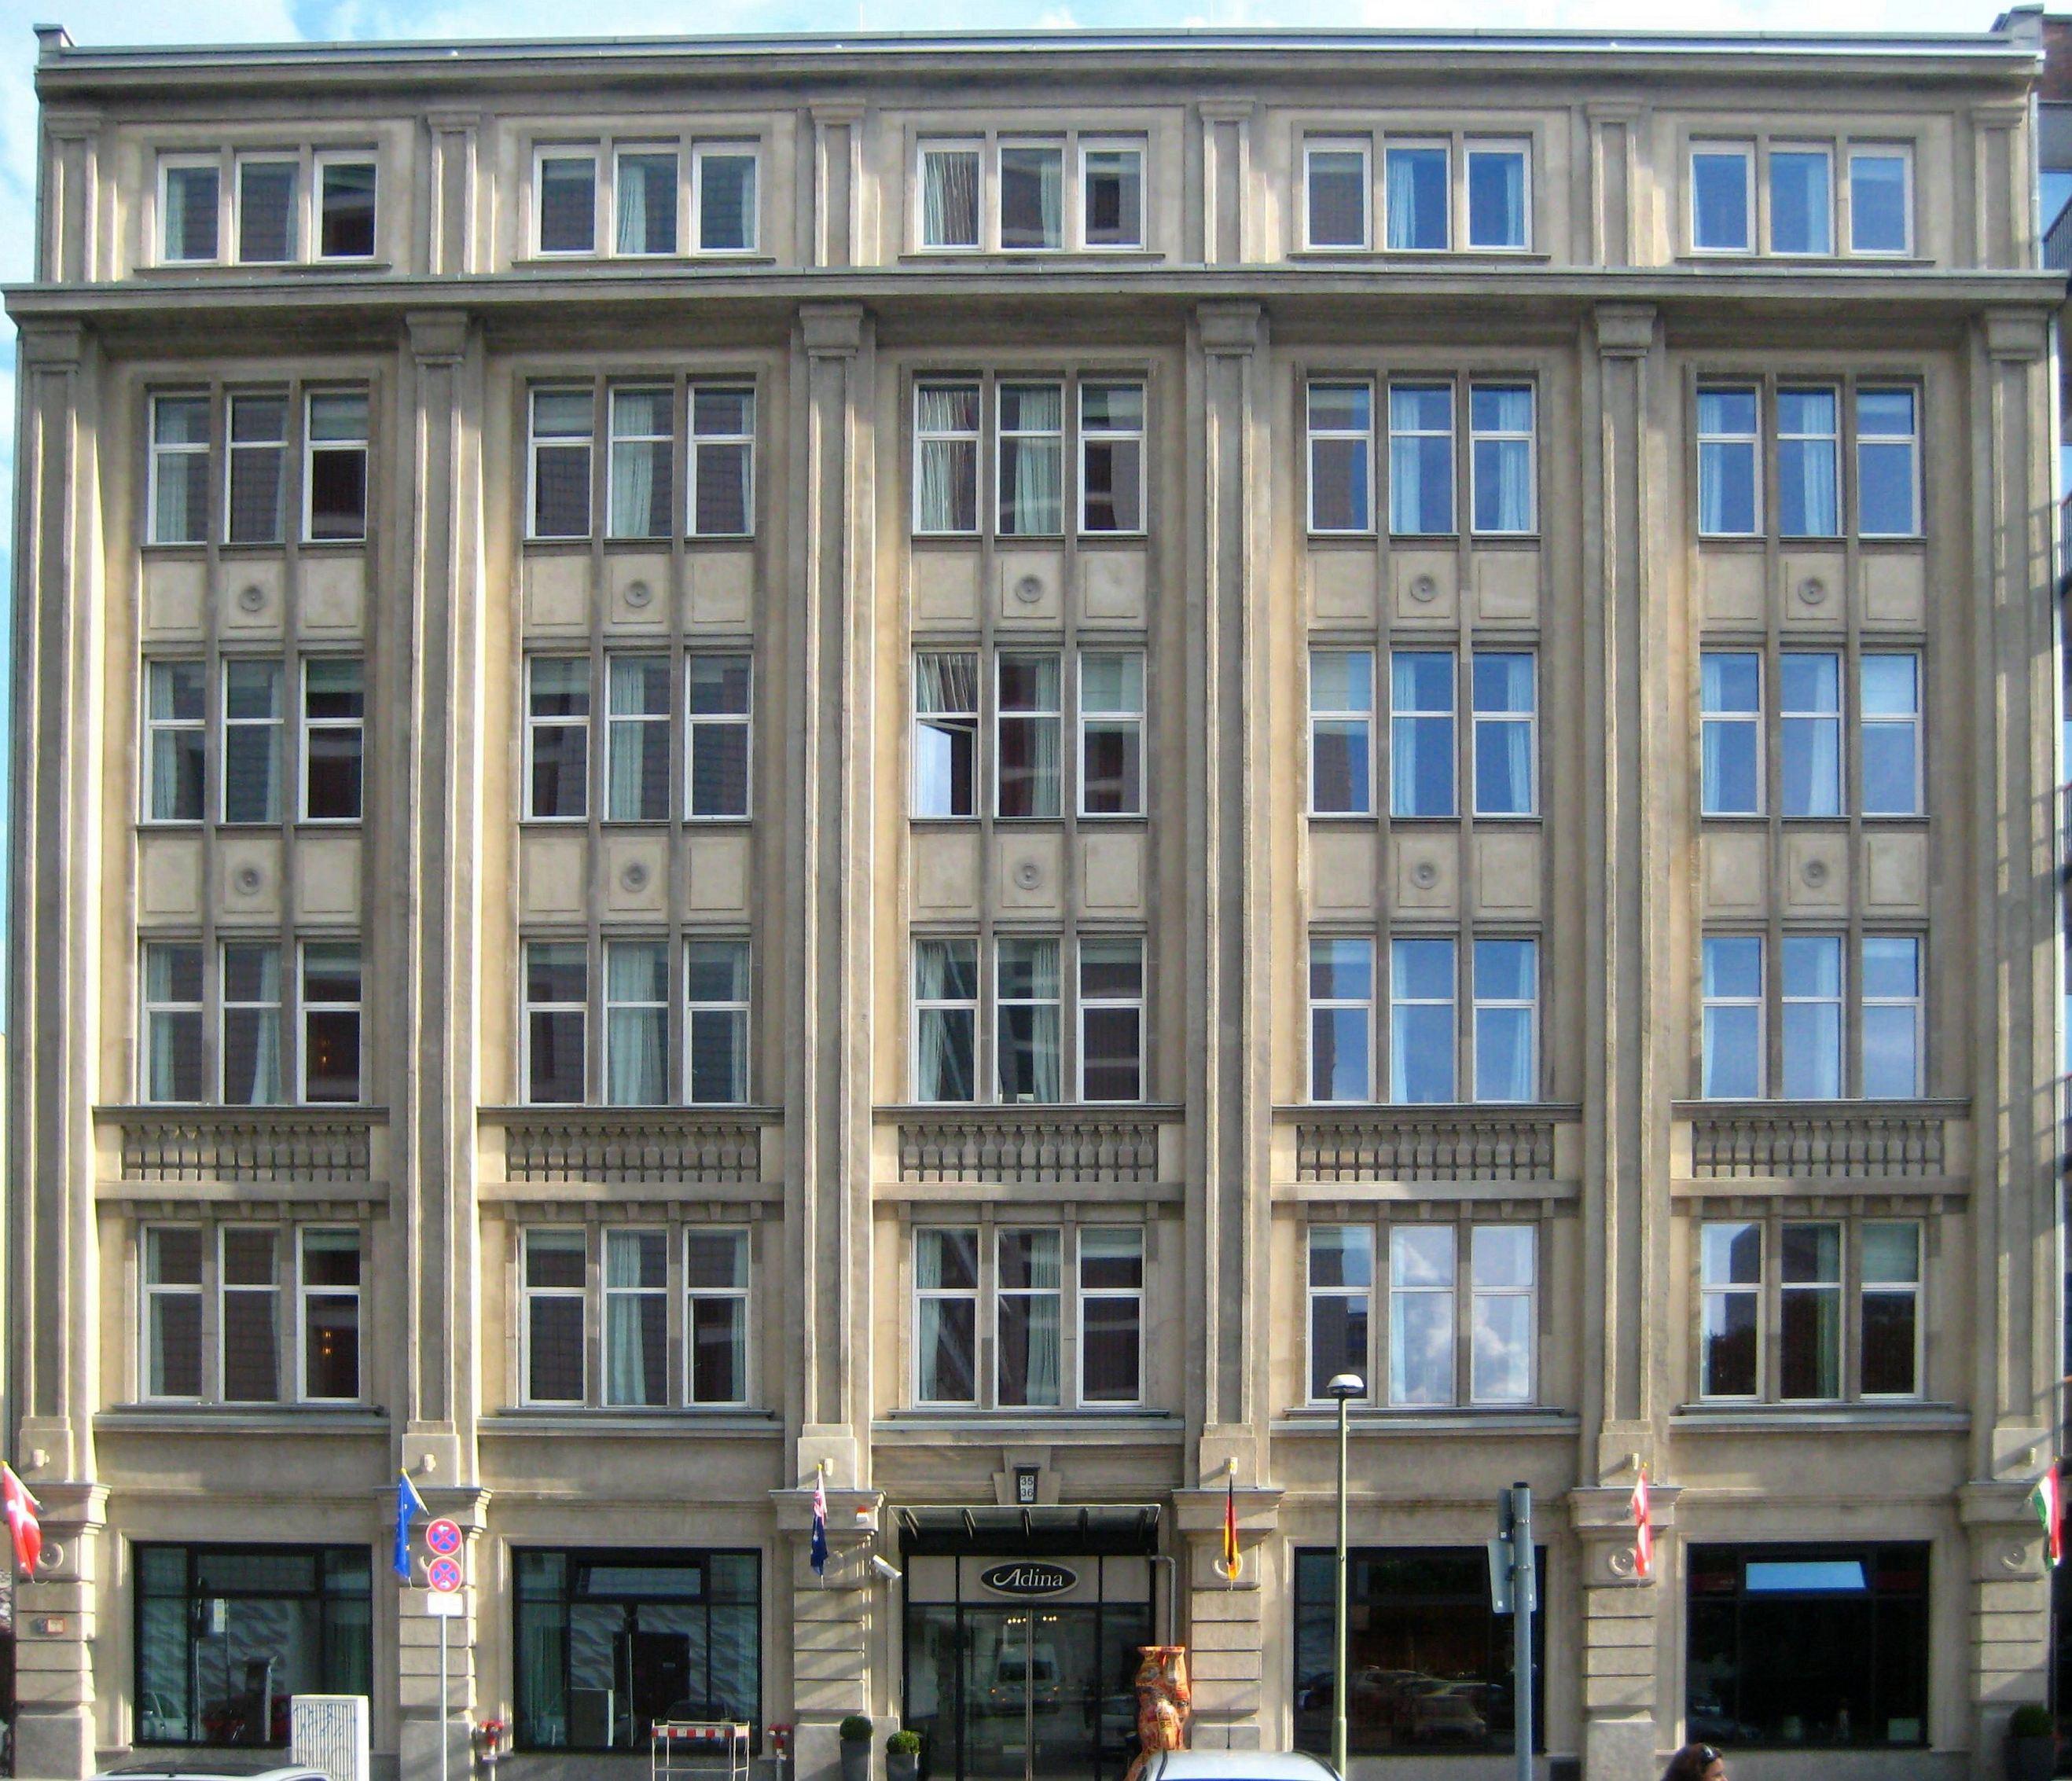 Hotel Berlin Nahe Mebegelande